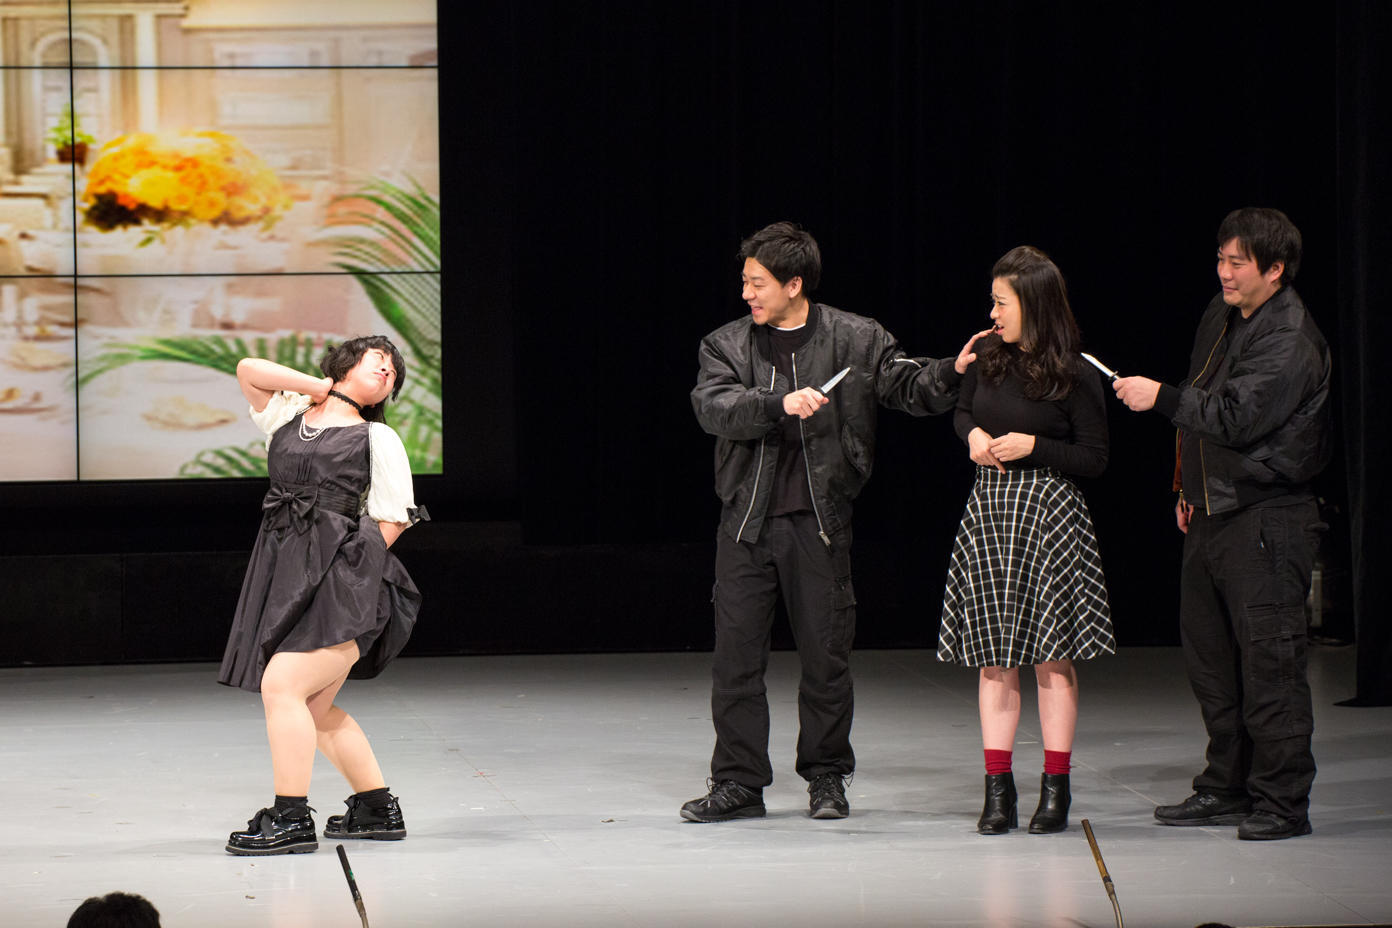 http://news.yoshimoto.co.jp/20180101200717-1488cd04edd5b8e552bc9bf5dc0e4e0b435e5102.jpg